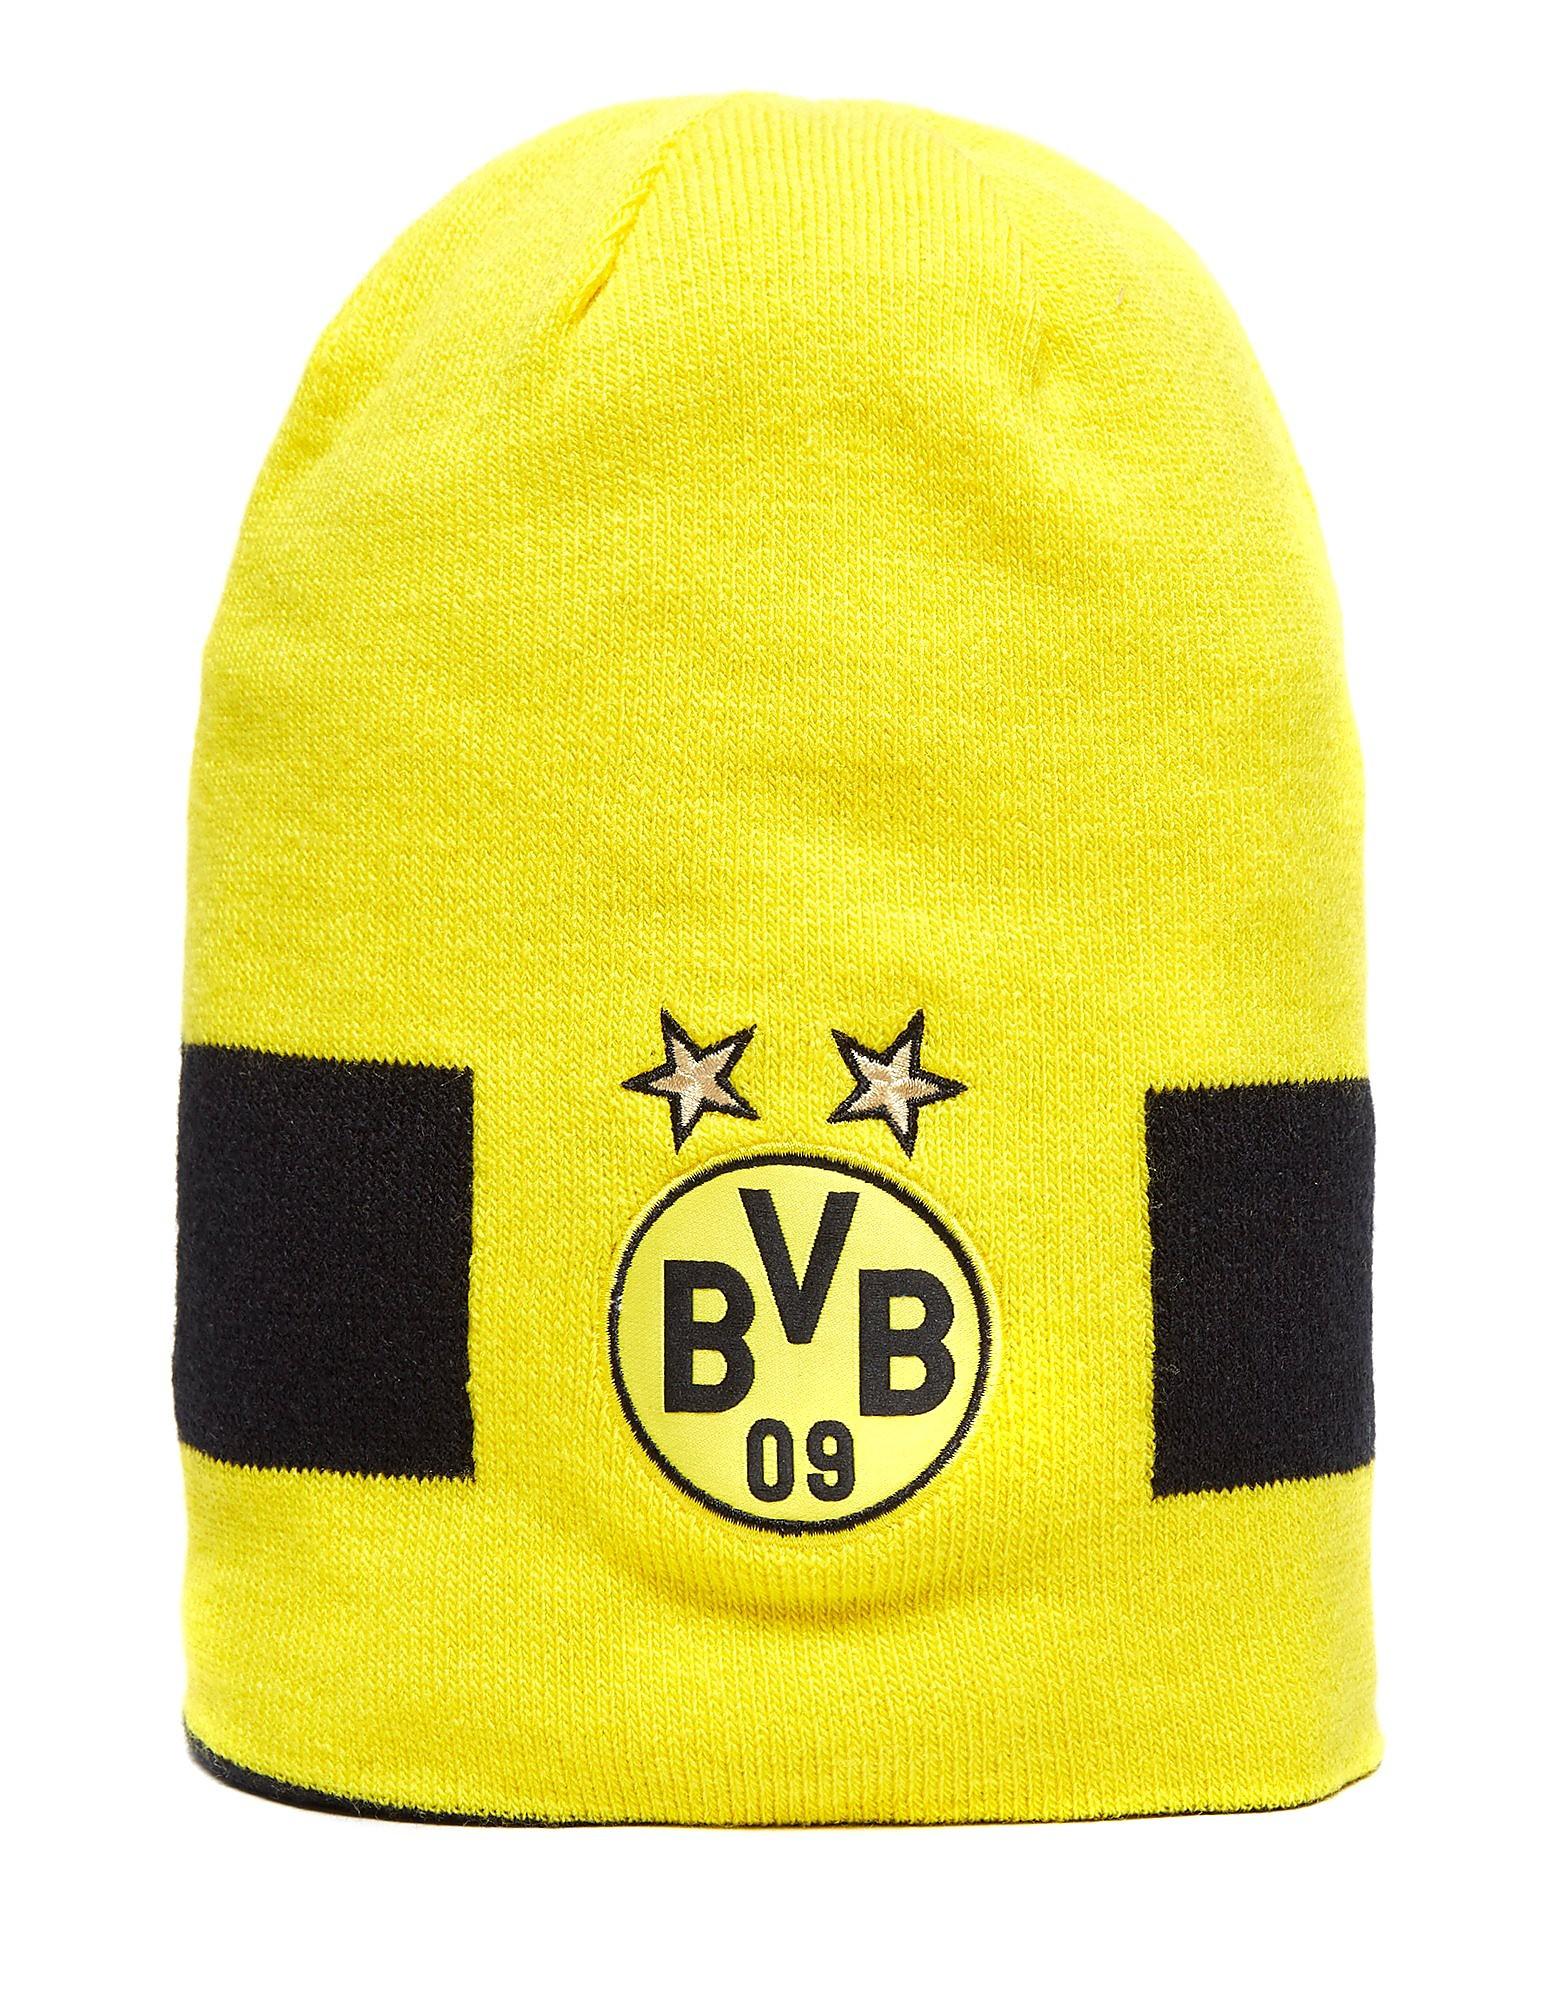 Image of   PUMA Borussia Dortmund Performance Beanie Hat